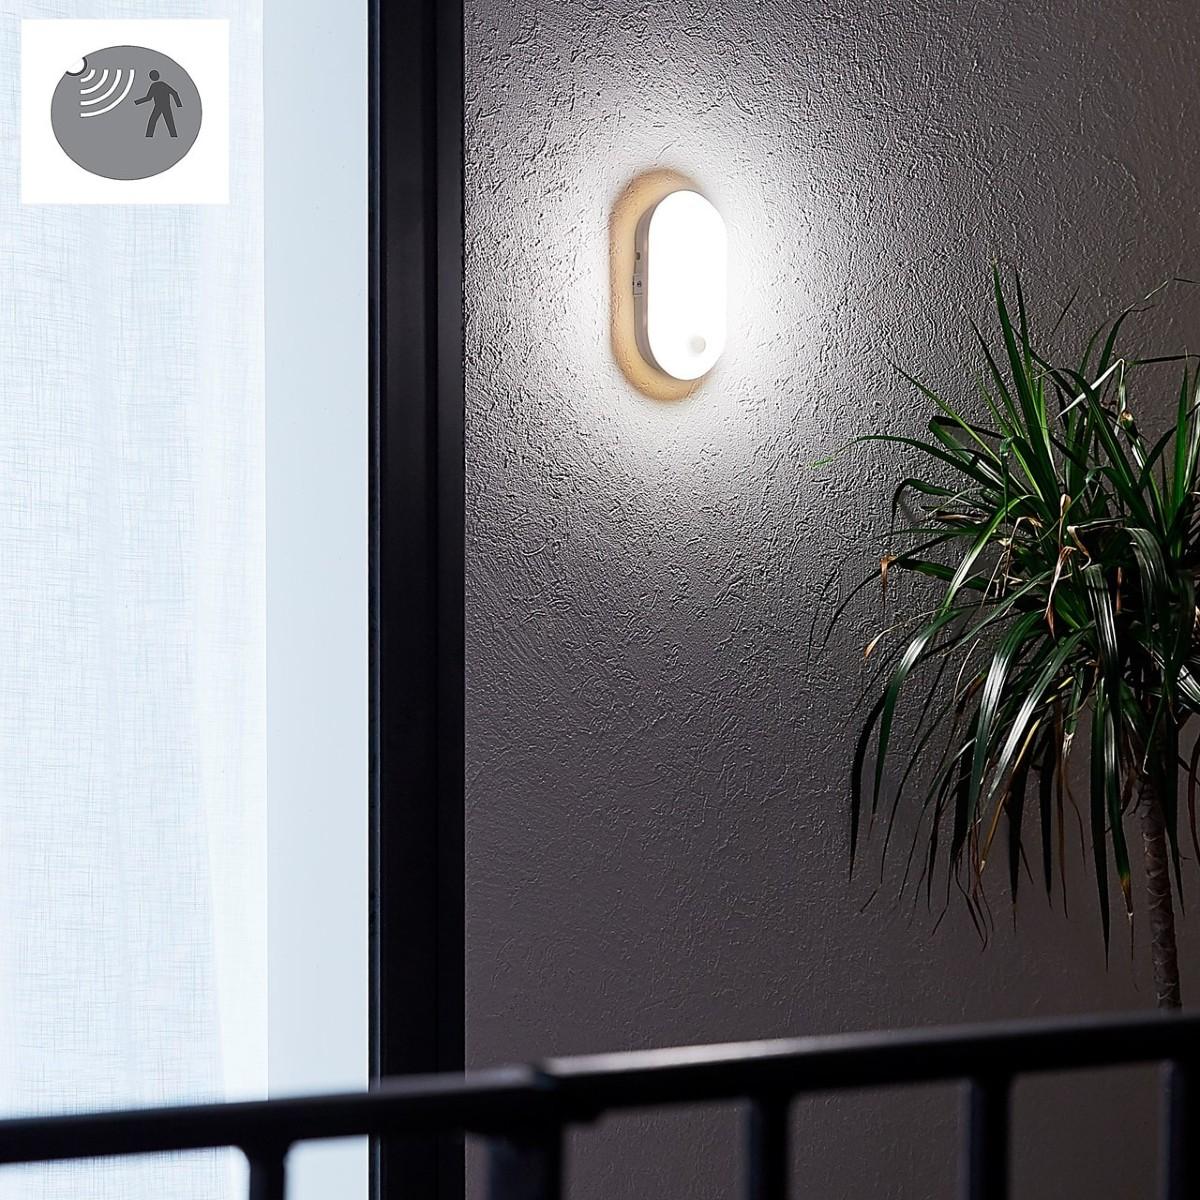 Catalogo Leroy Merlin illuminazione giardino 1